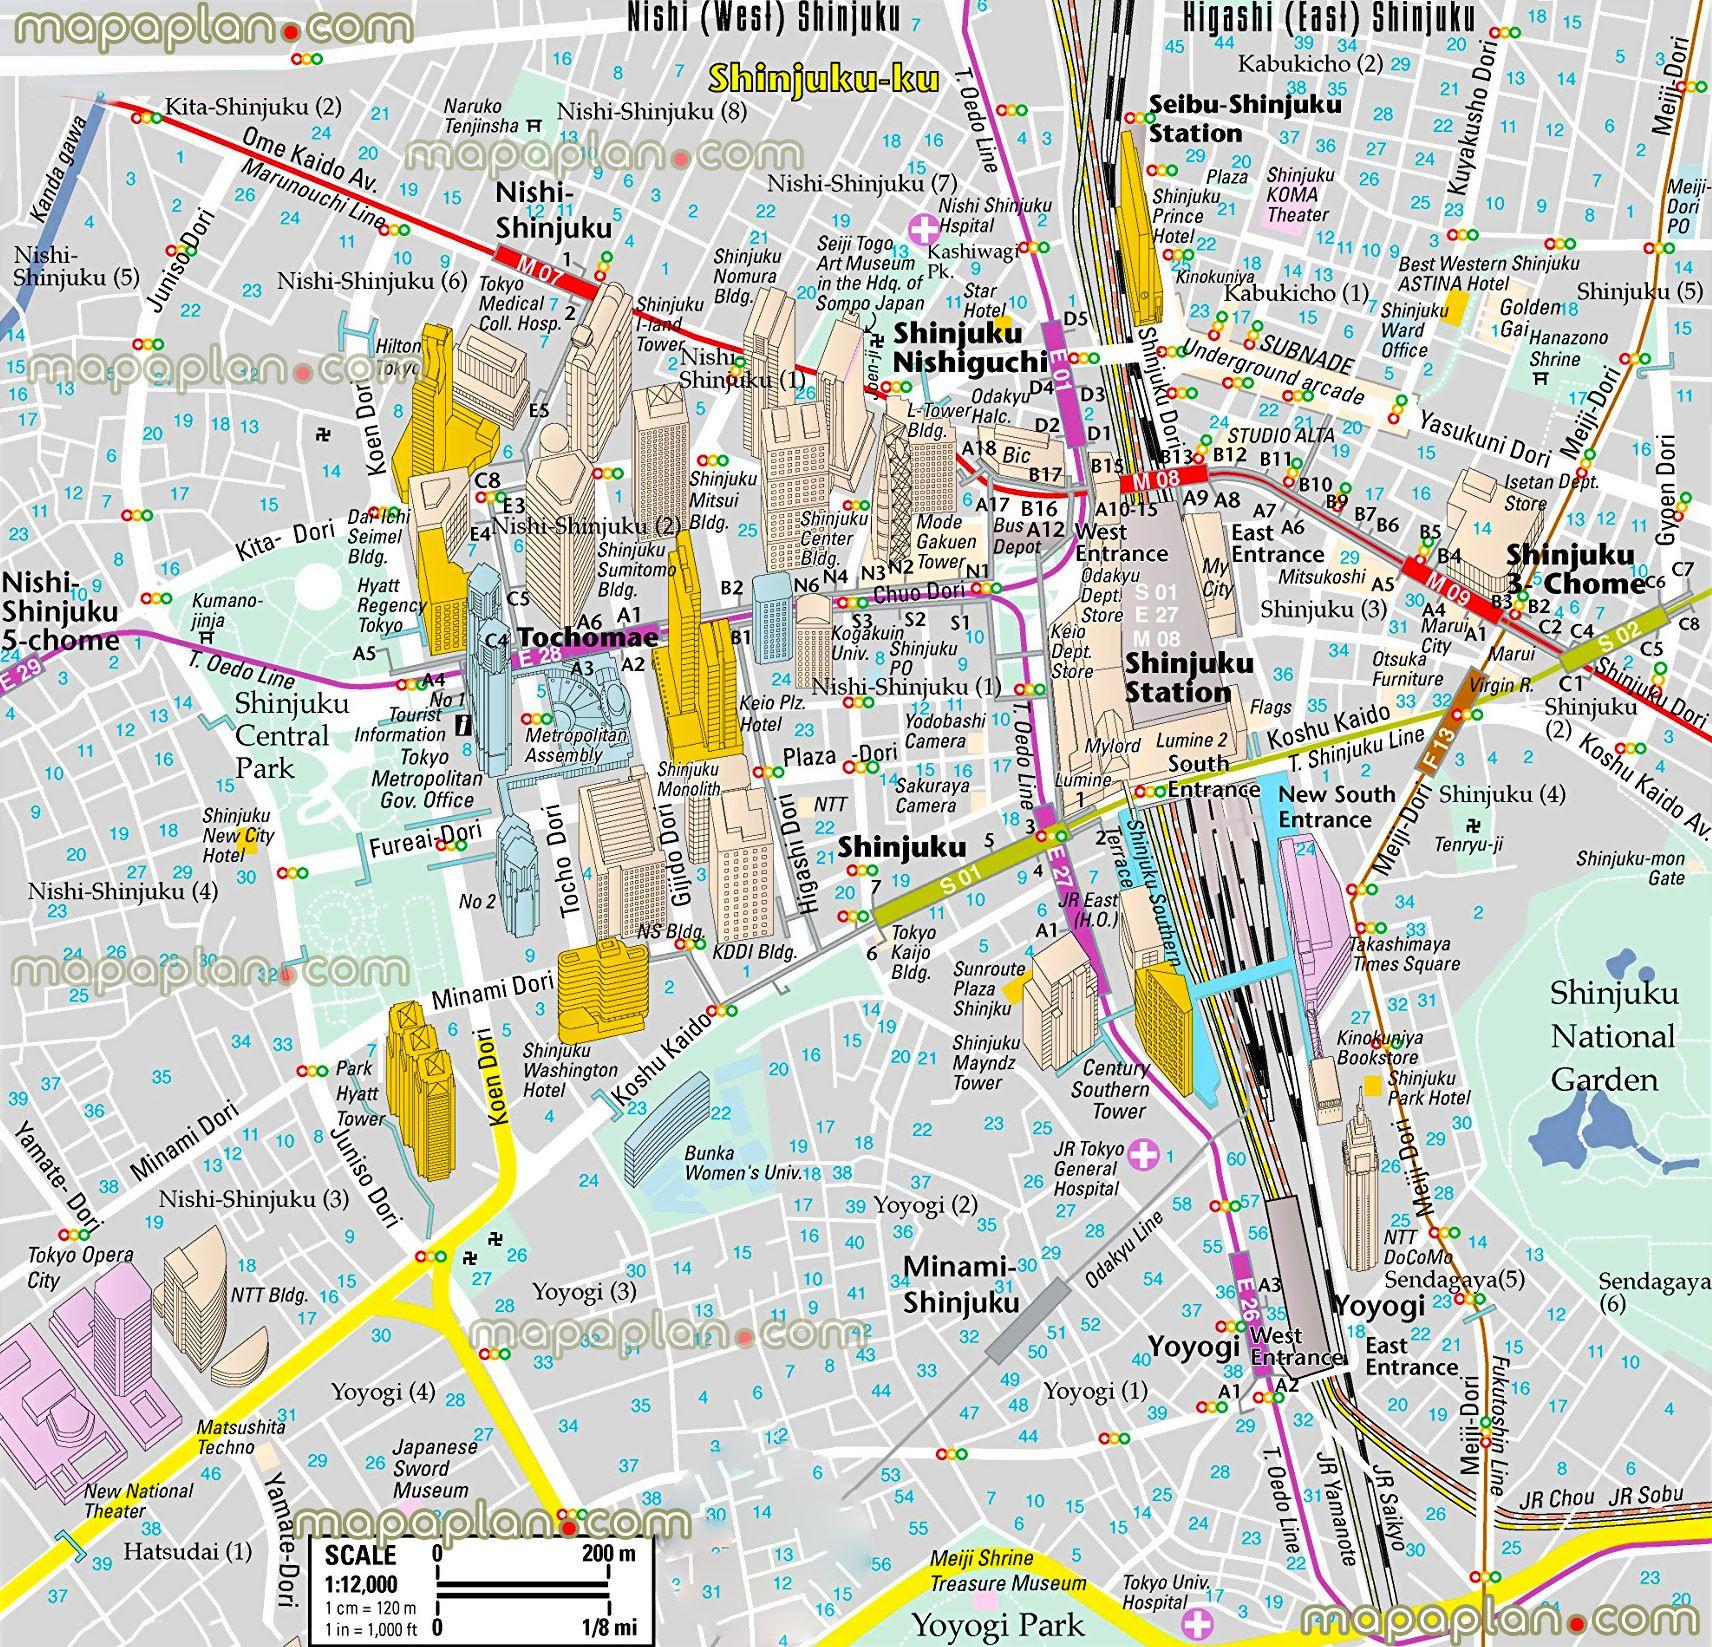 tokyotoptouristattractionsmap10shinjukudistrictmetrostation